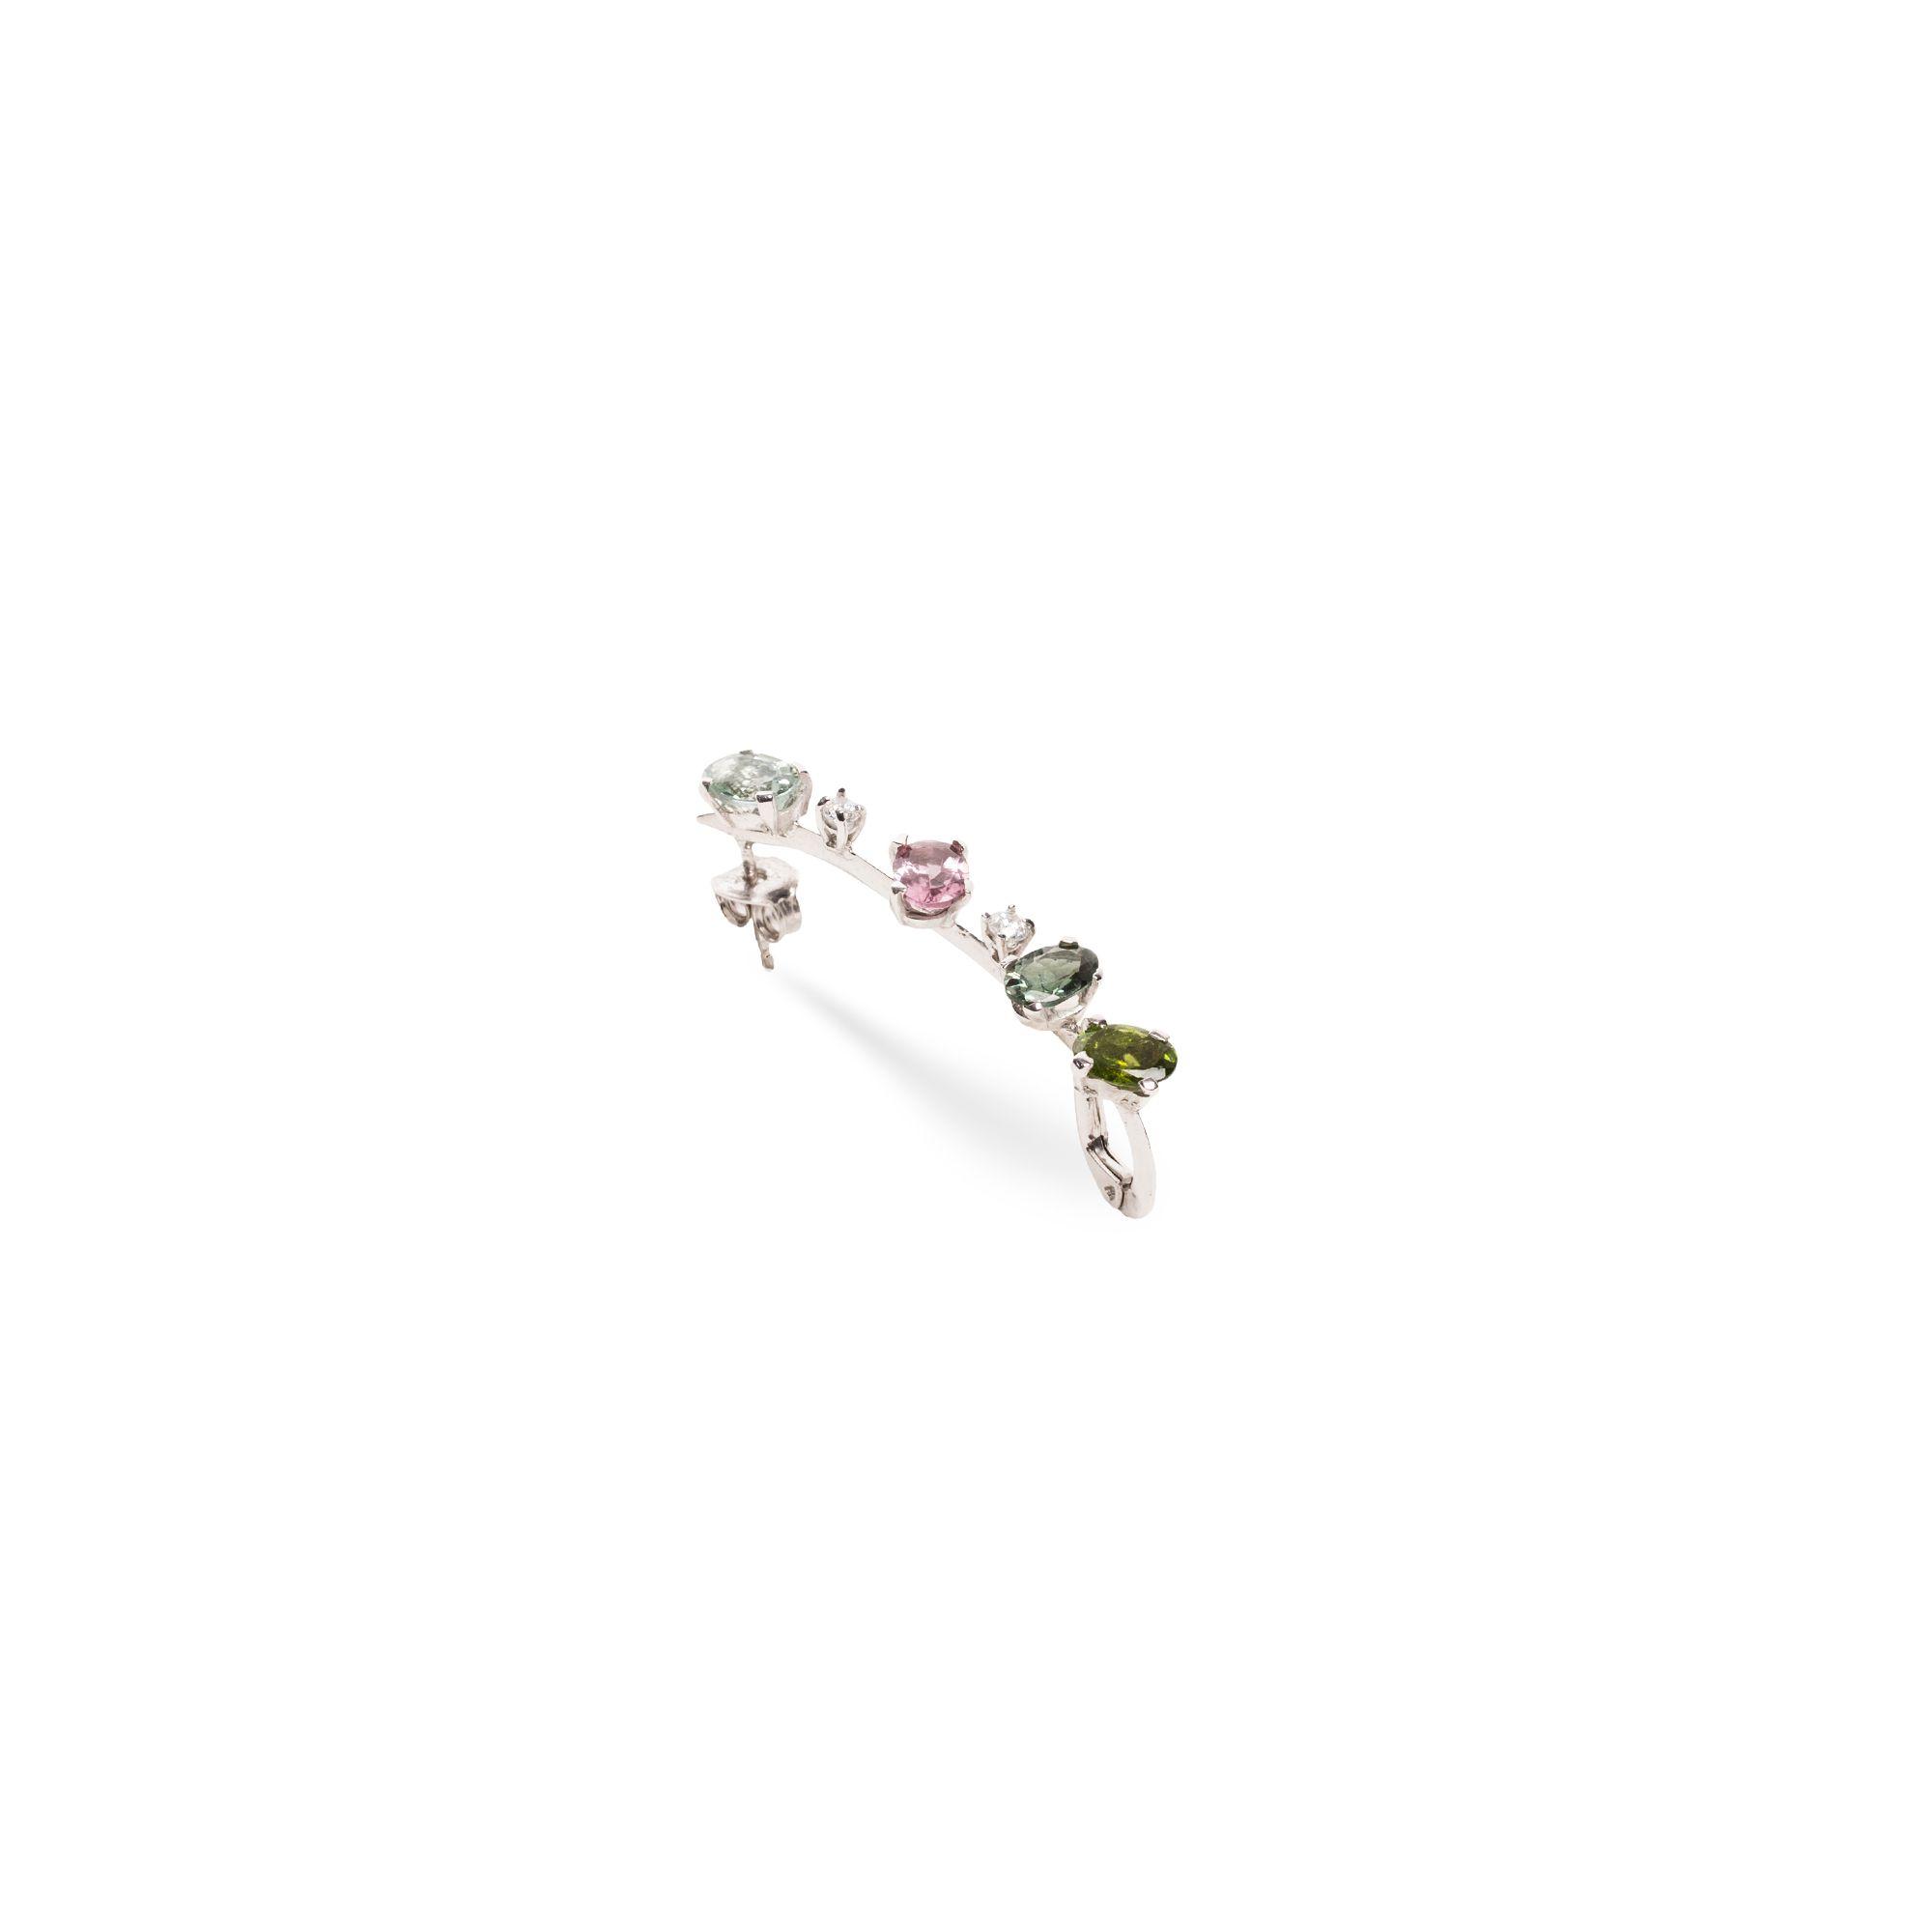 'Lancia' earring with tourmaline Silver mono earring with tourmalines and sapphires